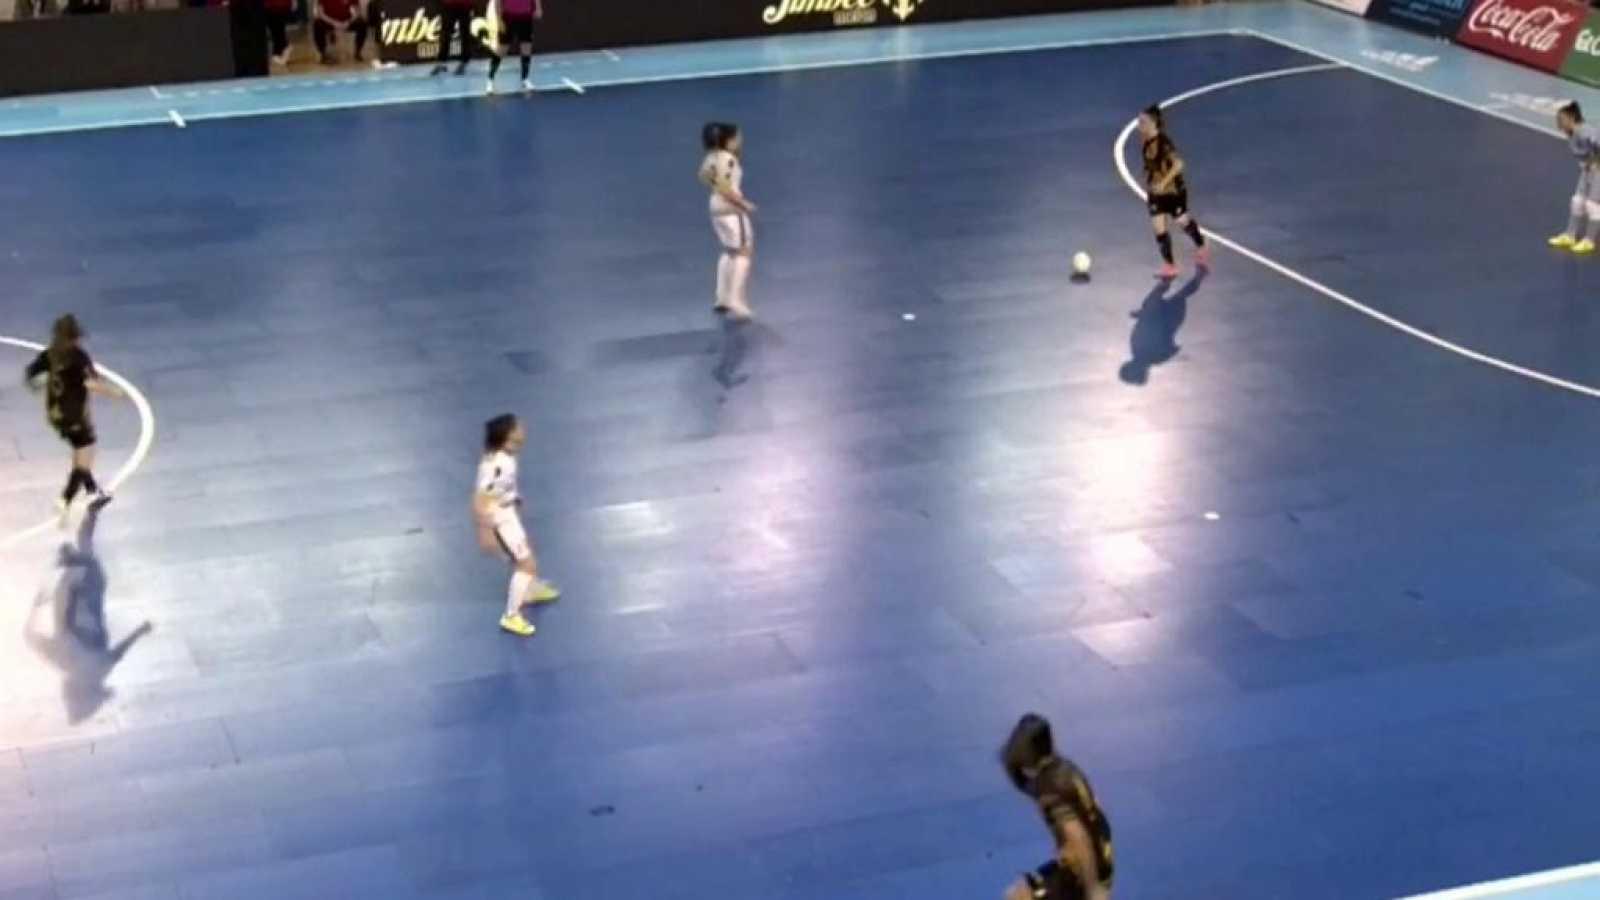 Fútbol Sala - European Women's Futsal Tournament 2019. Final: Jimbeee Roldan - Kick Off, desde San Javier (Murcia) - ver ahora